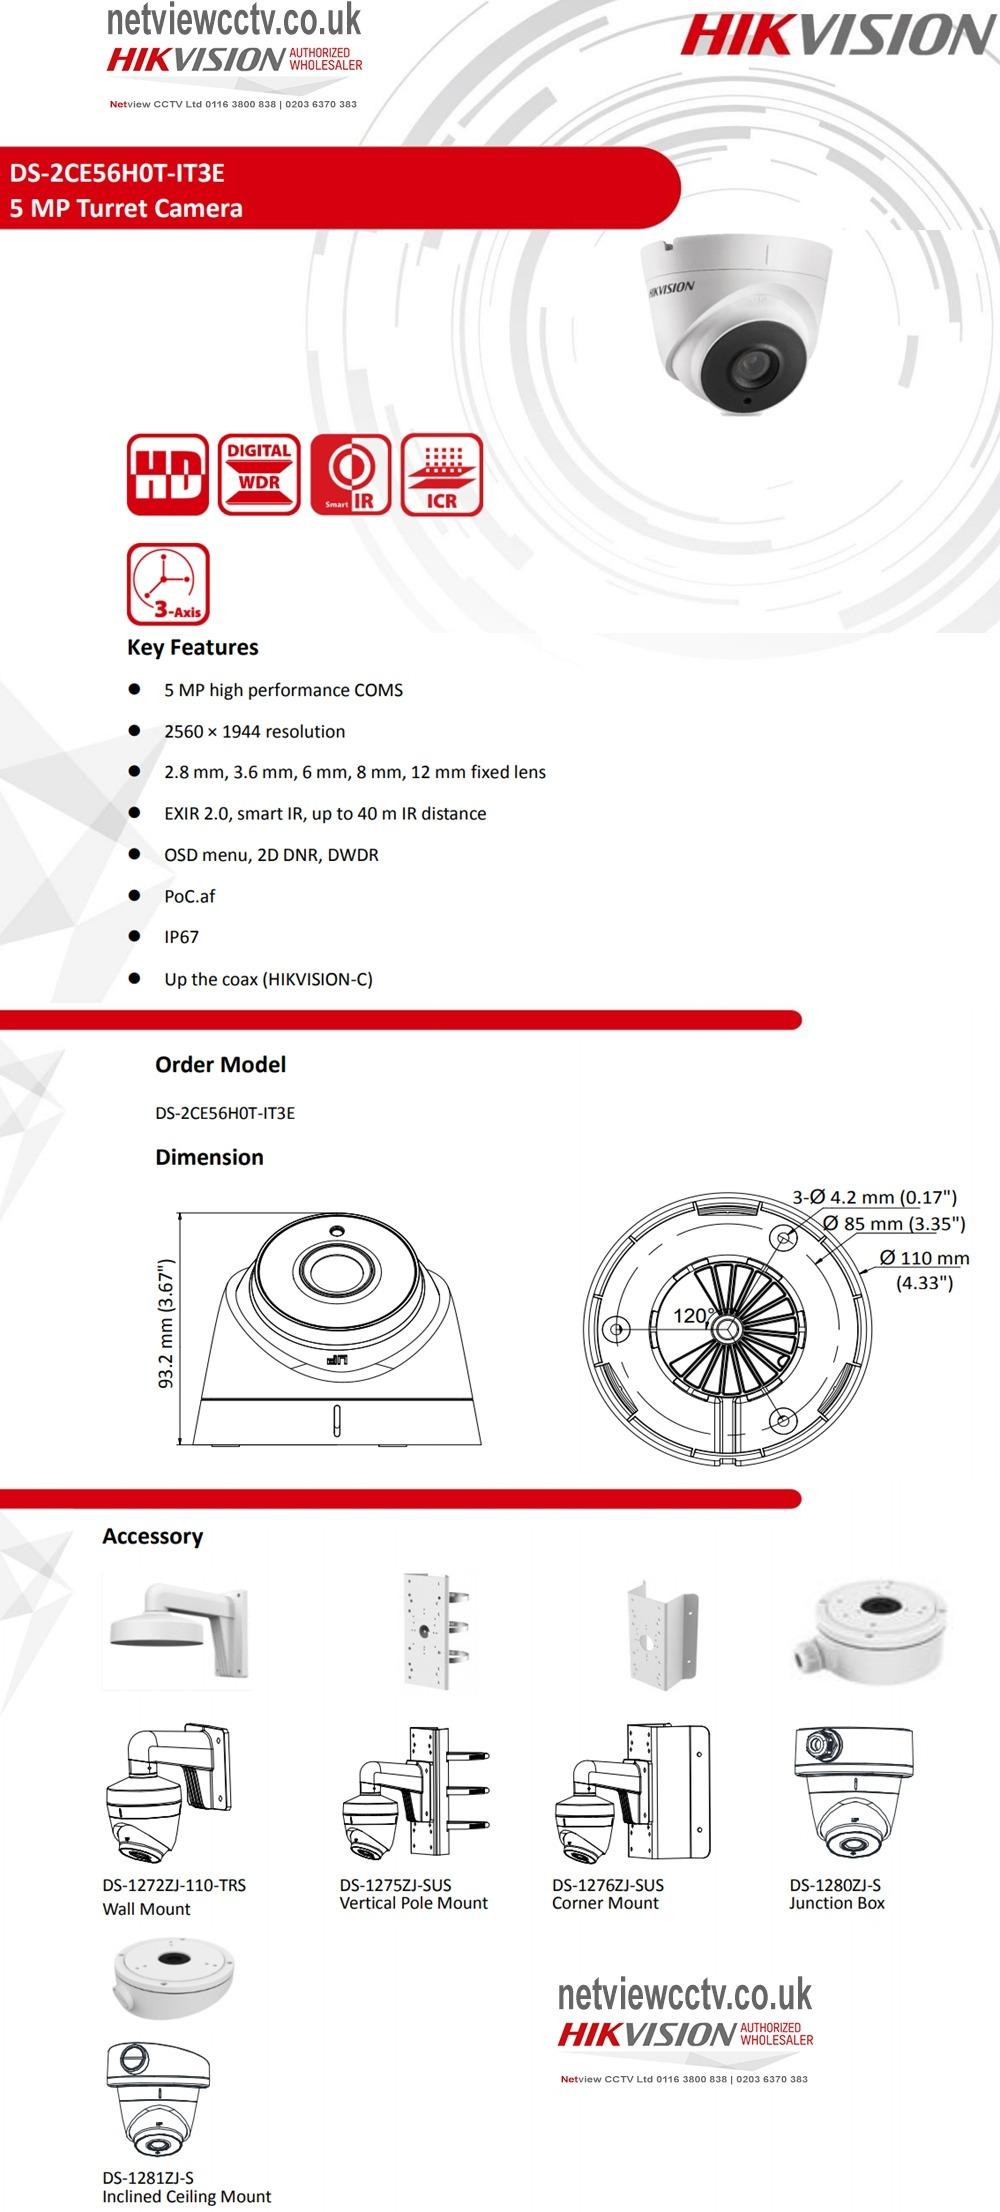 5MP DS-2CE56H0T-IT3E Hikvision 2.8mm 85.5° PoC Turbo HD Dome Camera 40m IR